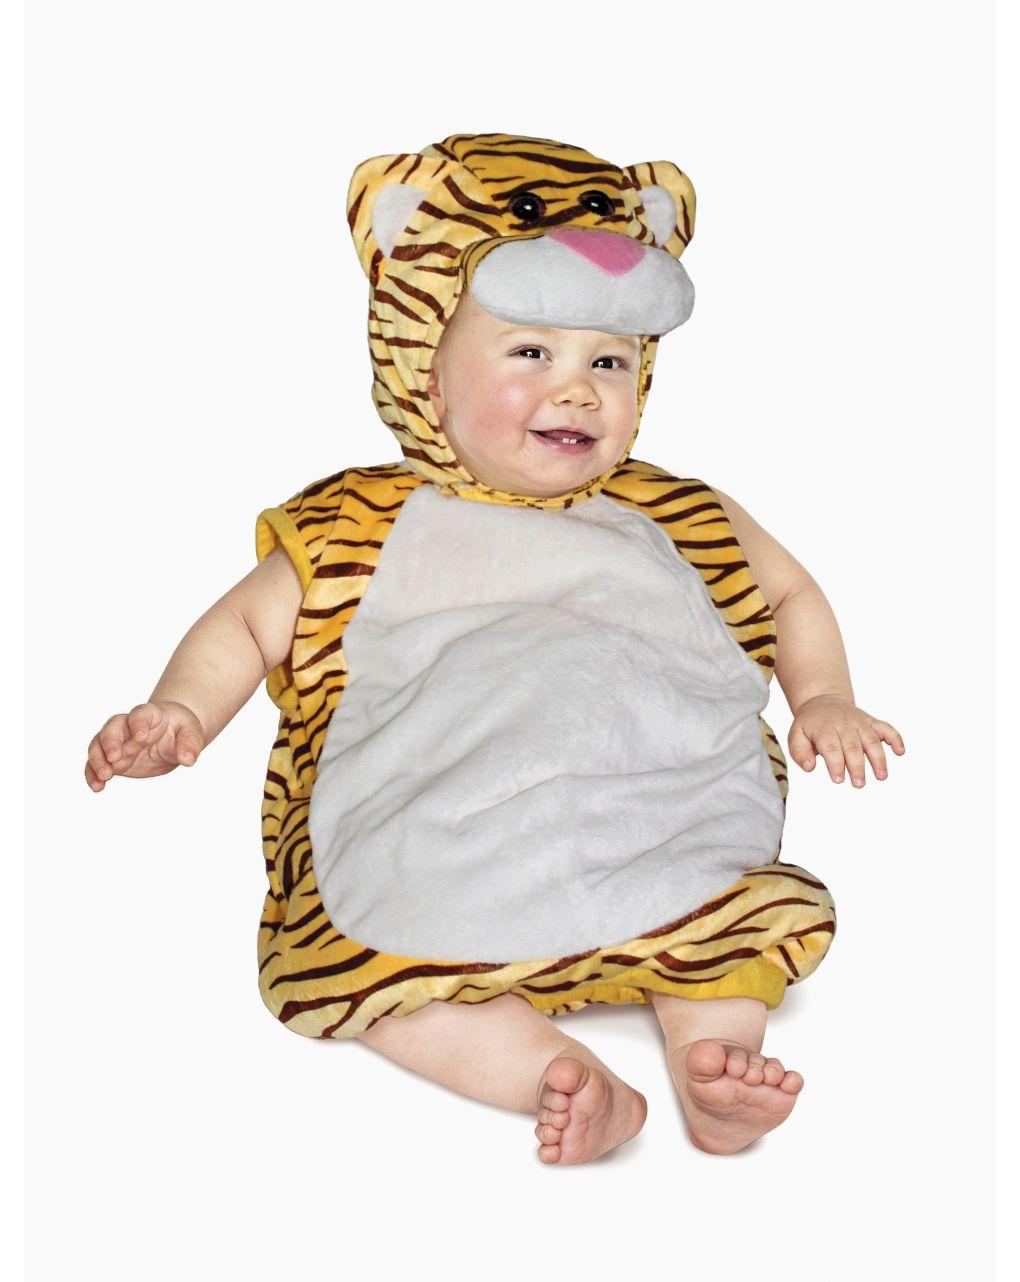 Costume tigrotto baby 12 mesi - Carnaval Queen